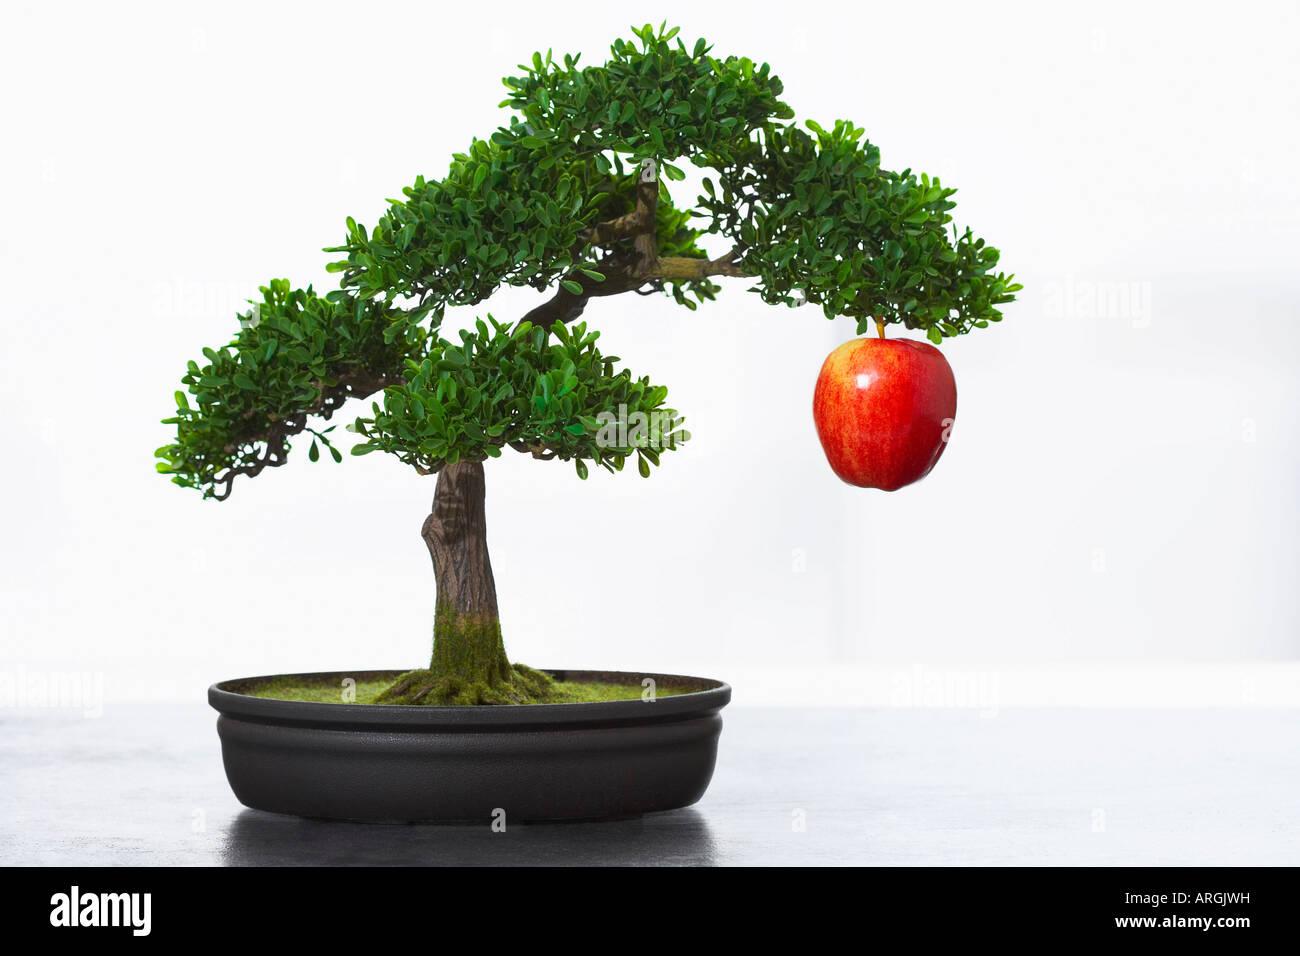 Apple Hanging From Bonsai Tree Stock Photo Alamy